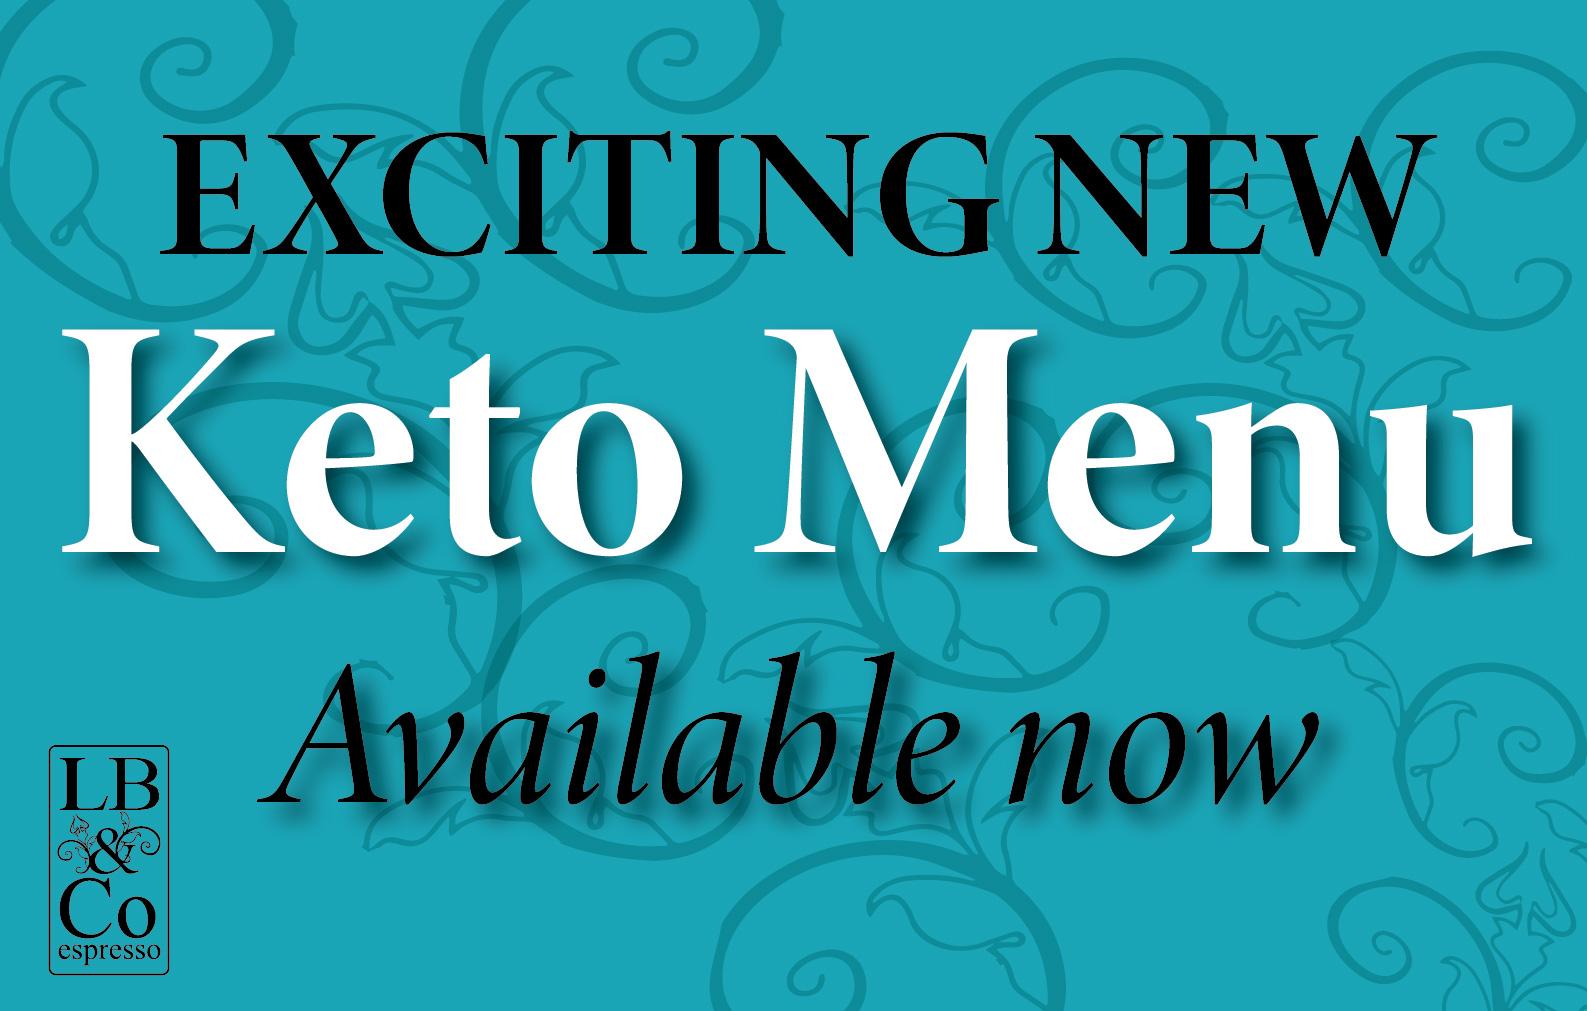 Keto Menu advert for LB & Co